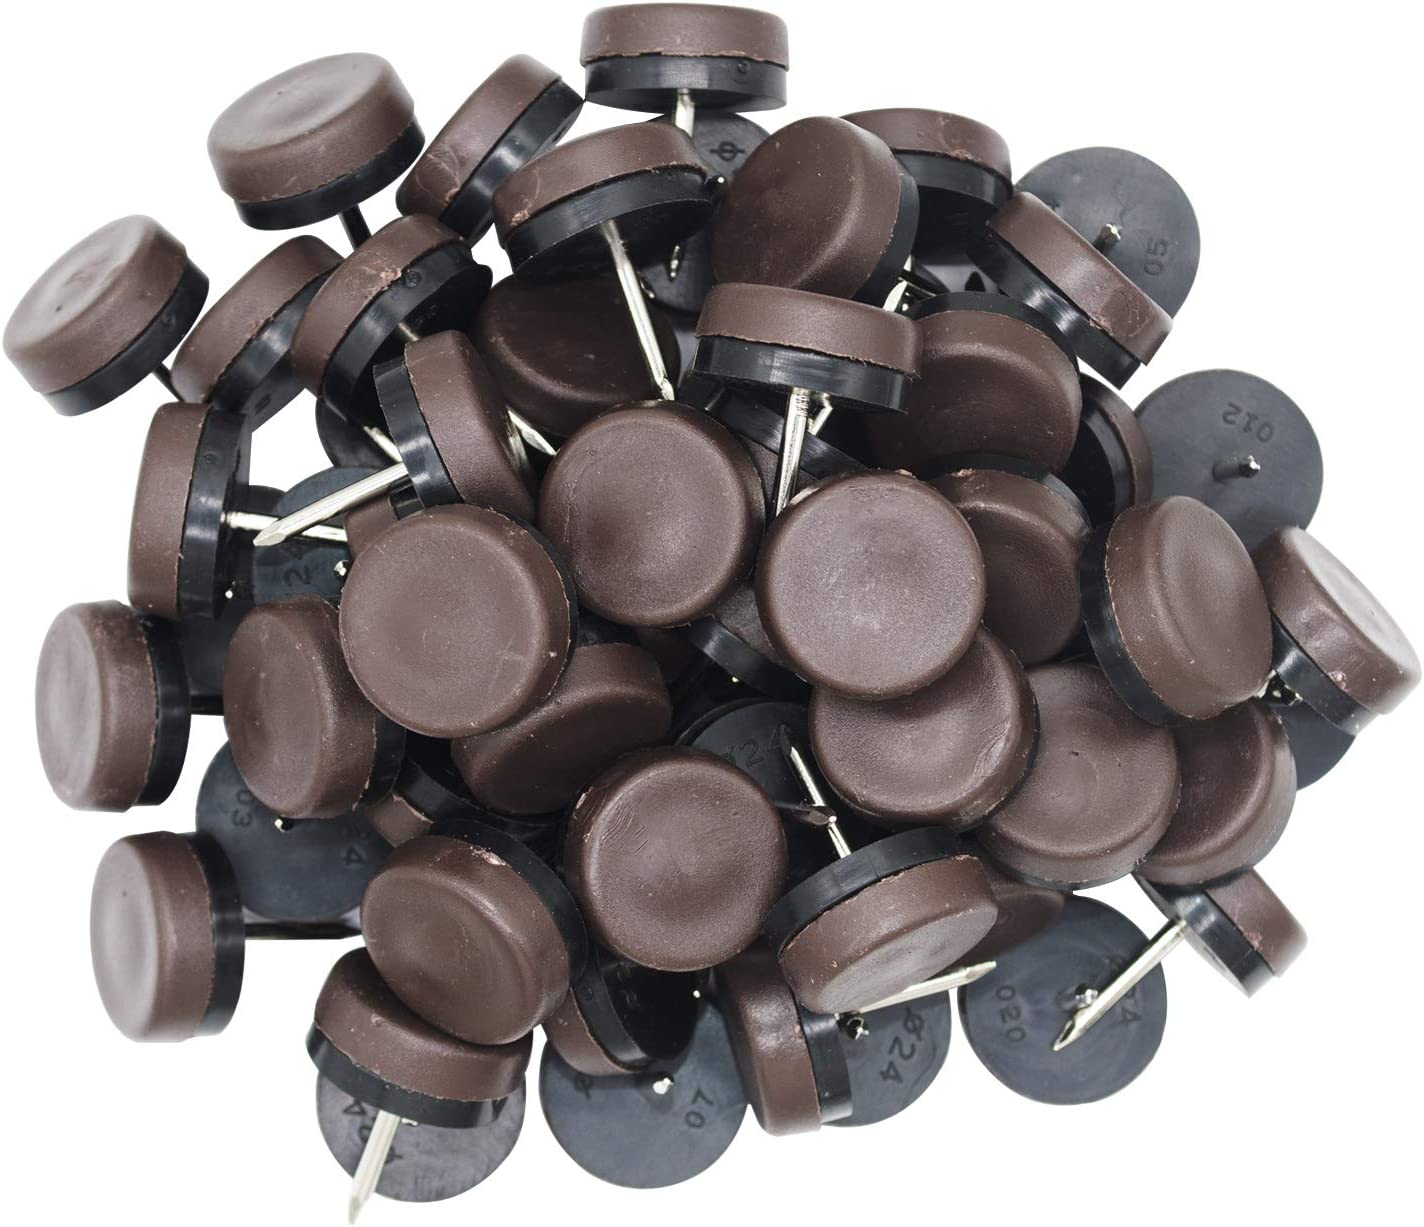 40pcs Round Nail-on Nylon Slider Pad Anti-Sliding Floor Protectors for Wood Furniture Chair Table Leg Feet (Φ18mm, Brown)